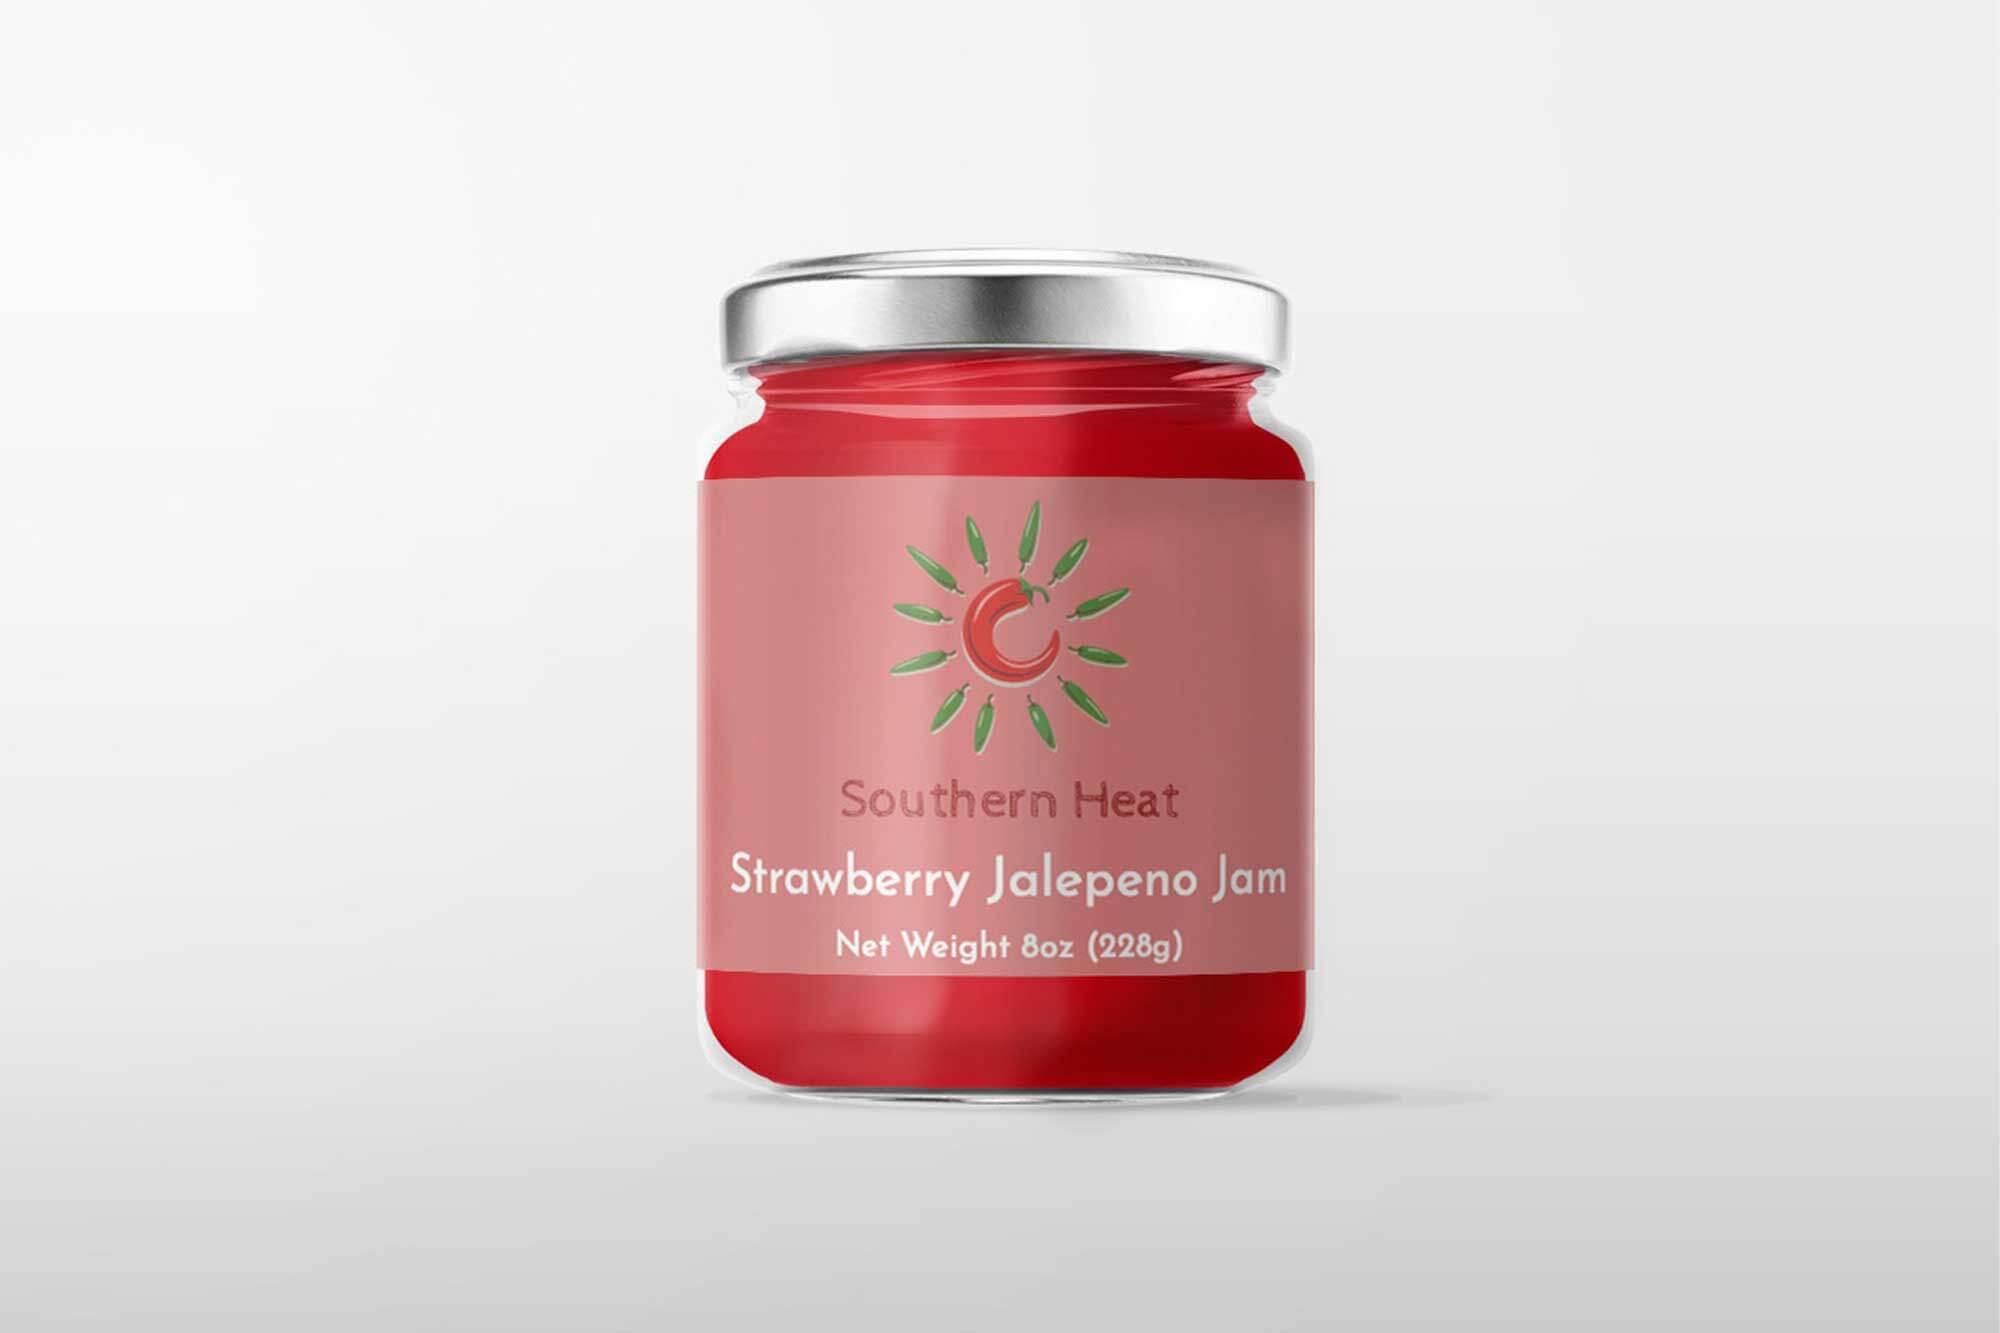 southern heat jar mockup